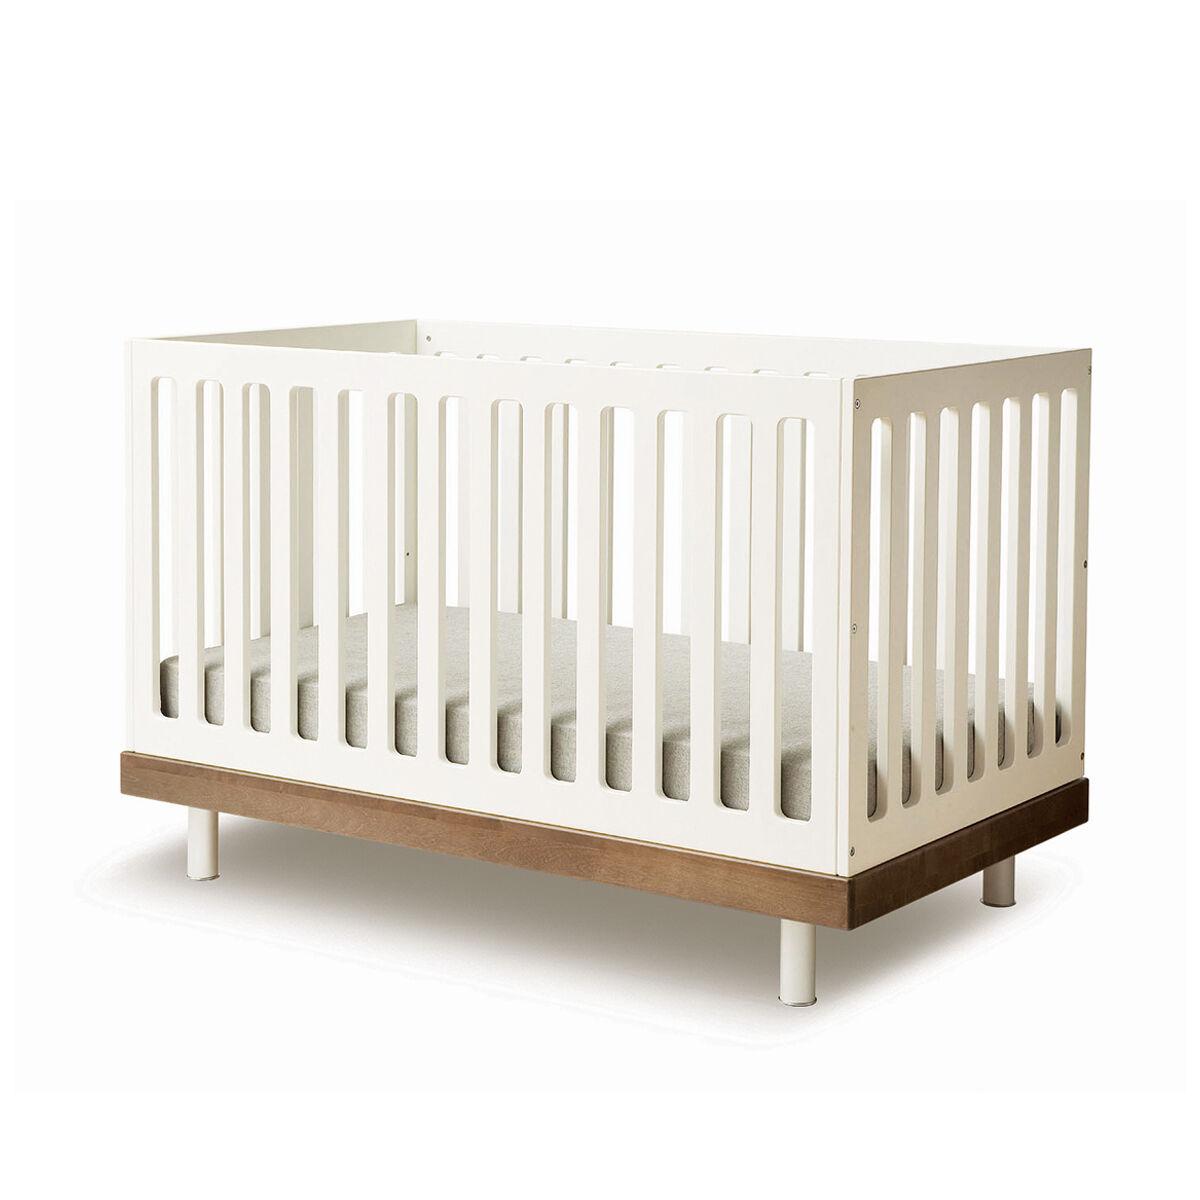 Oeuf Classic Crib (Color: Walnut)